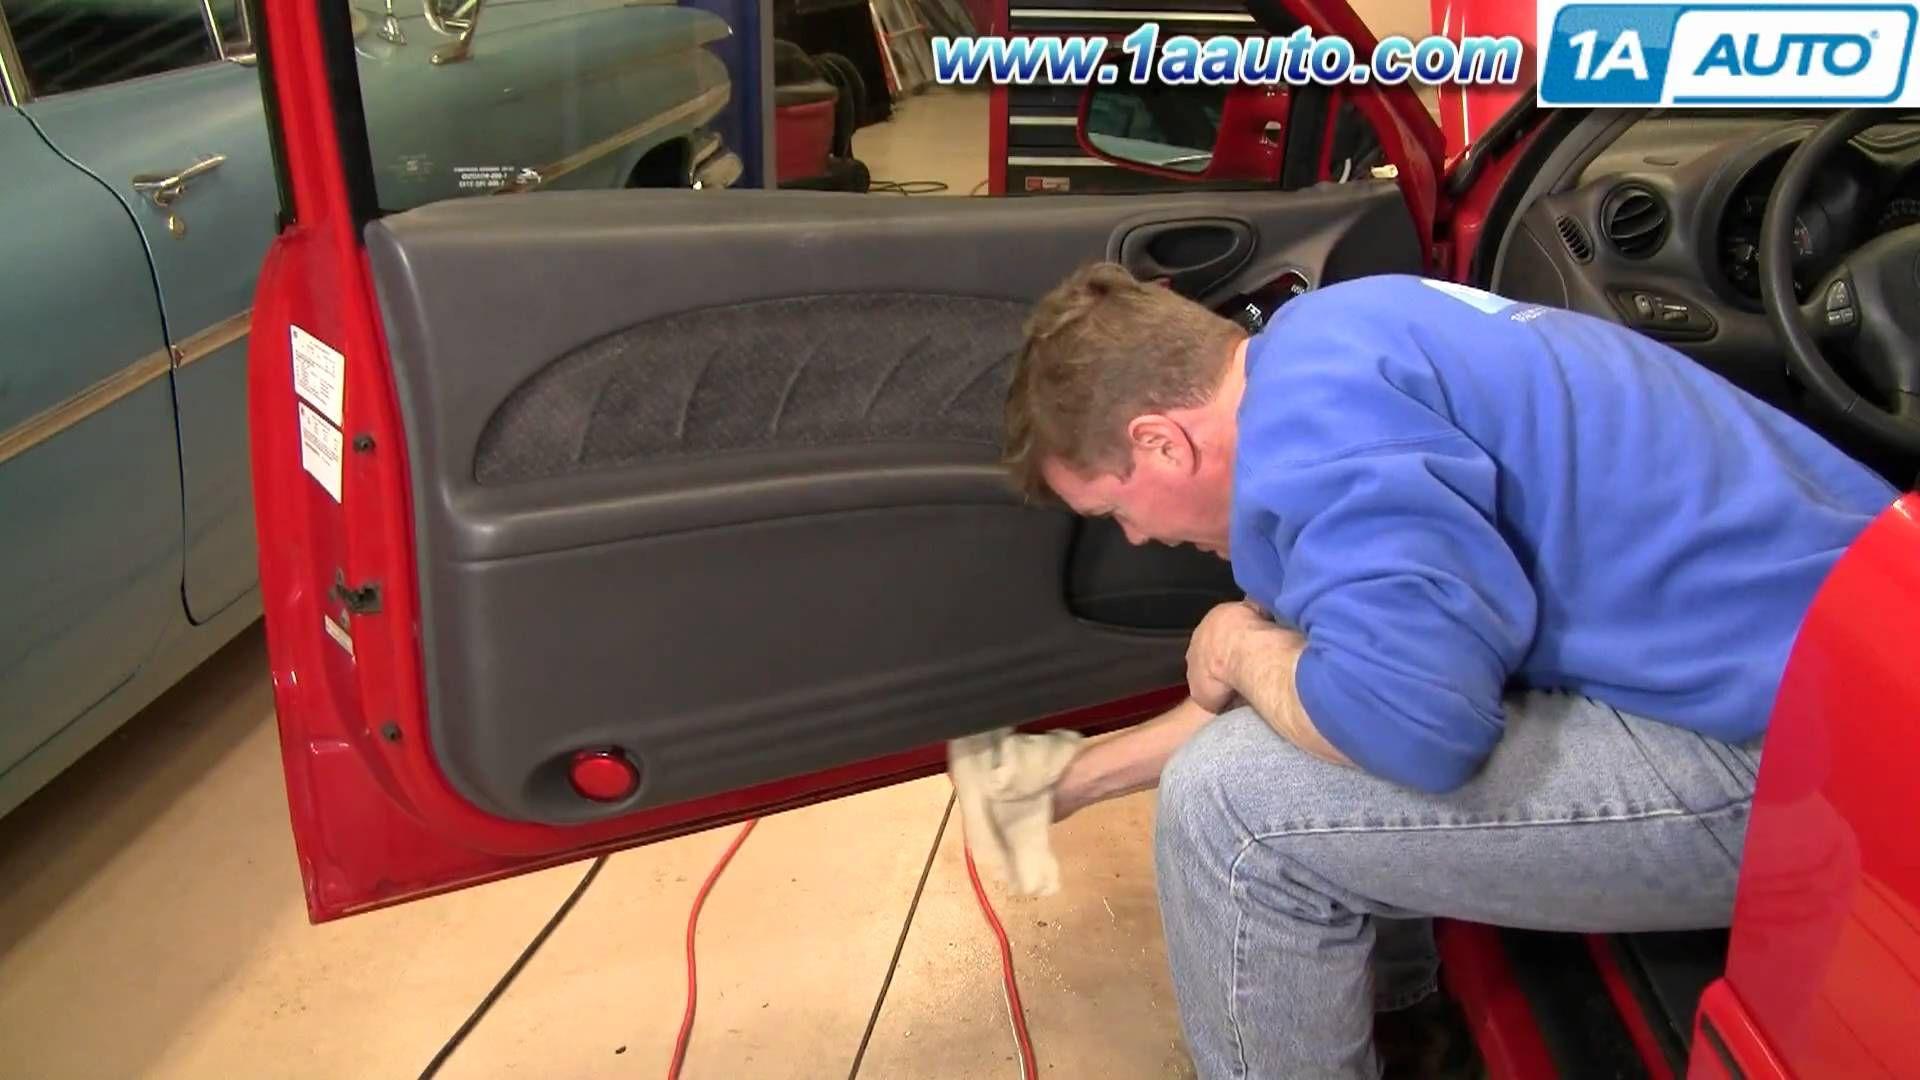 How To Install Replace Door Panel Pontiac Grand Am 99 06 1aauto Com Panel Doors Pontiac Grand Am Paneling